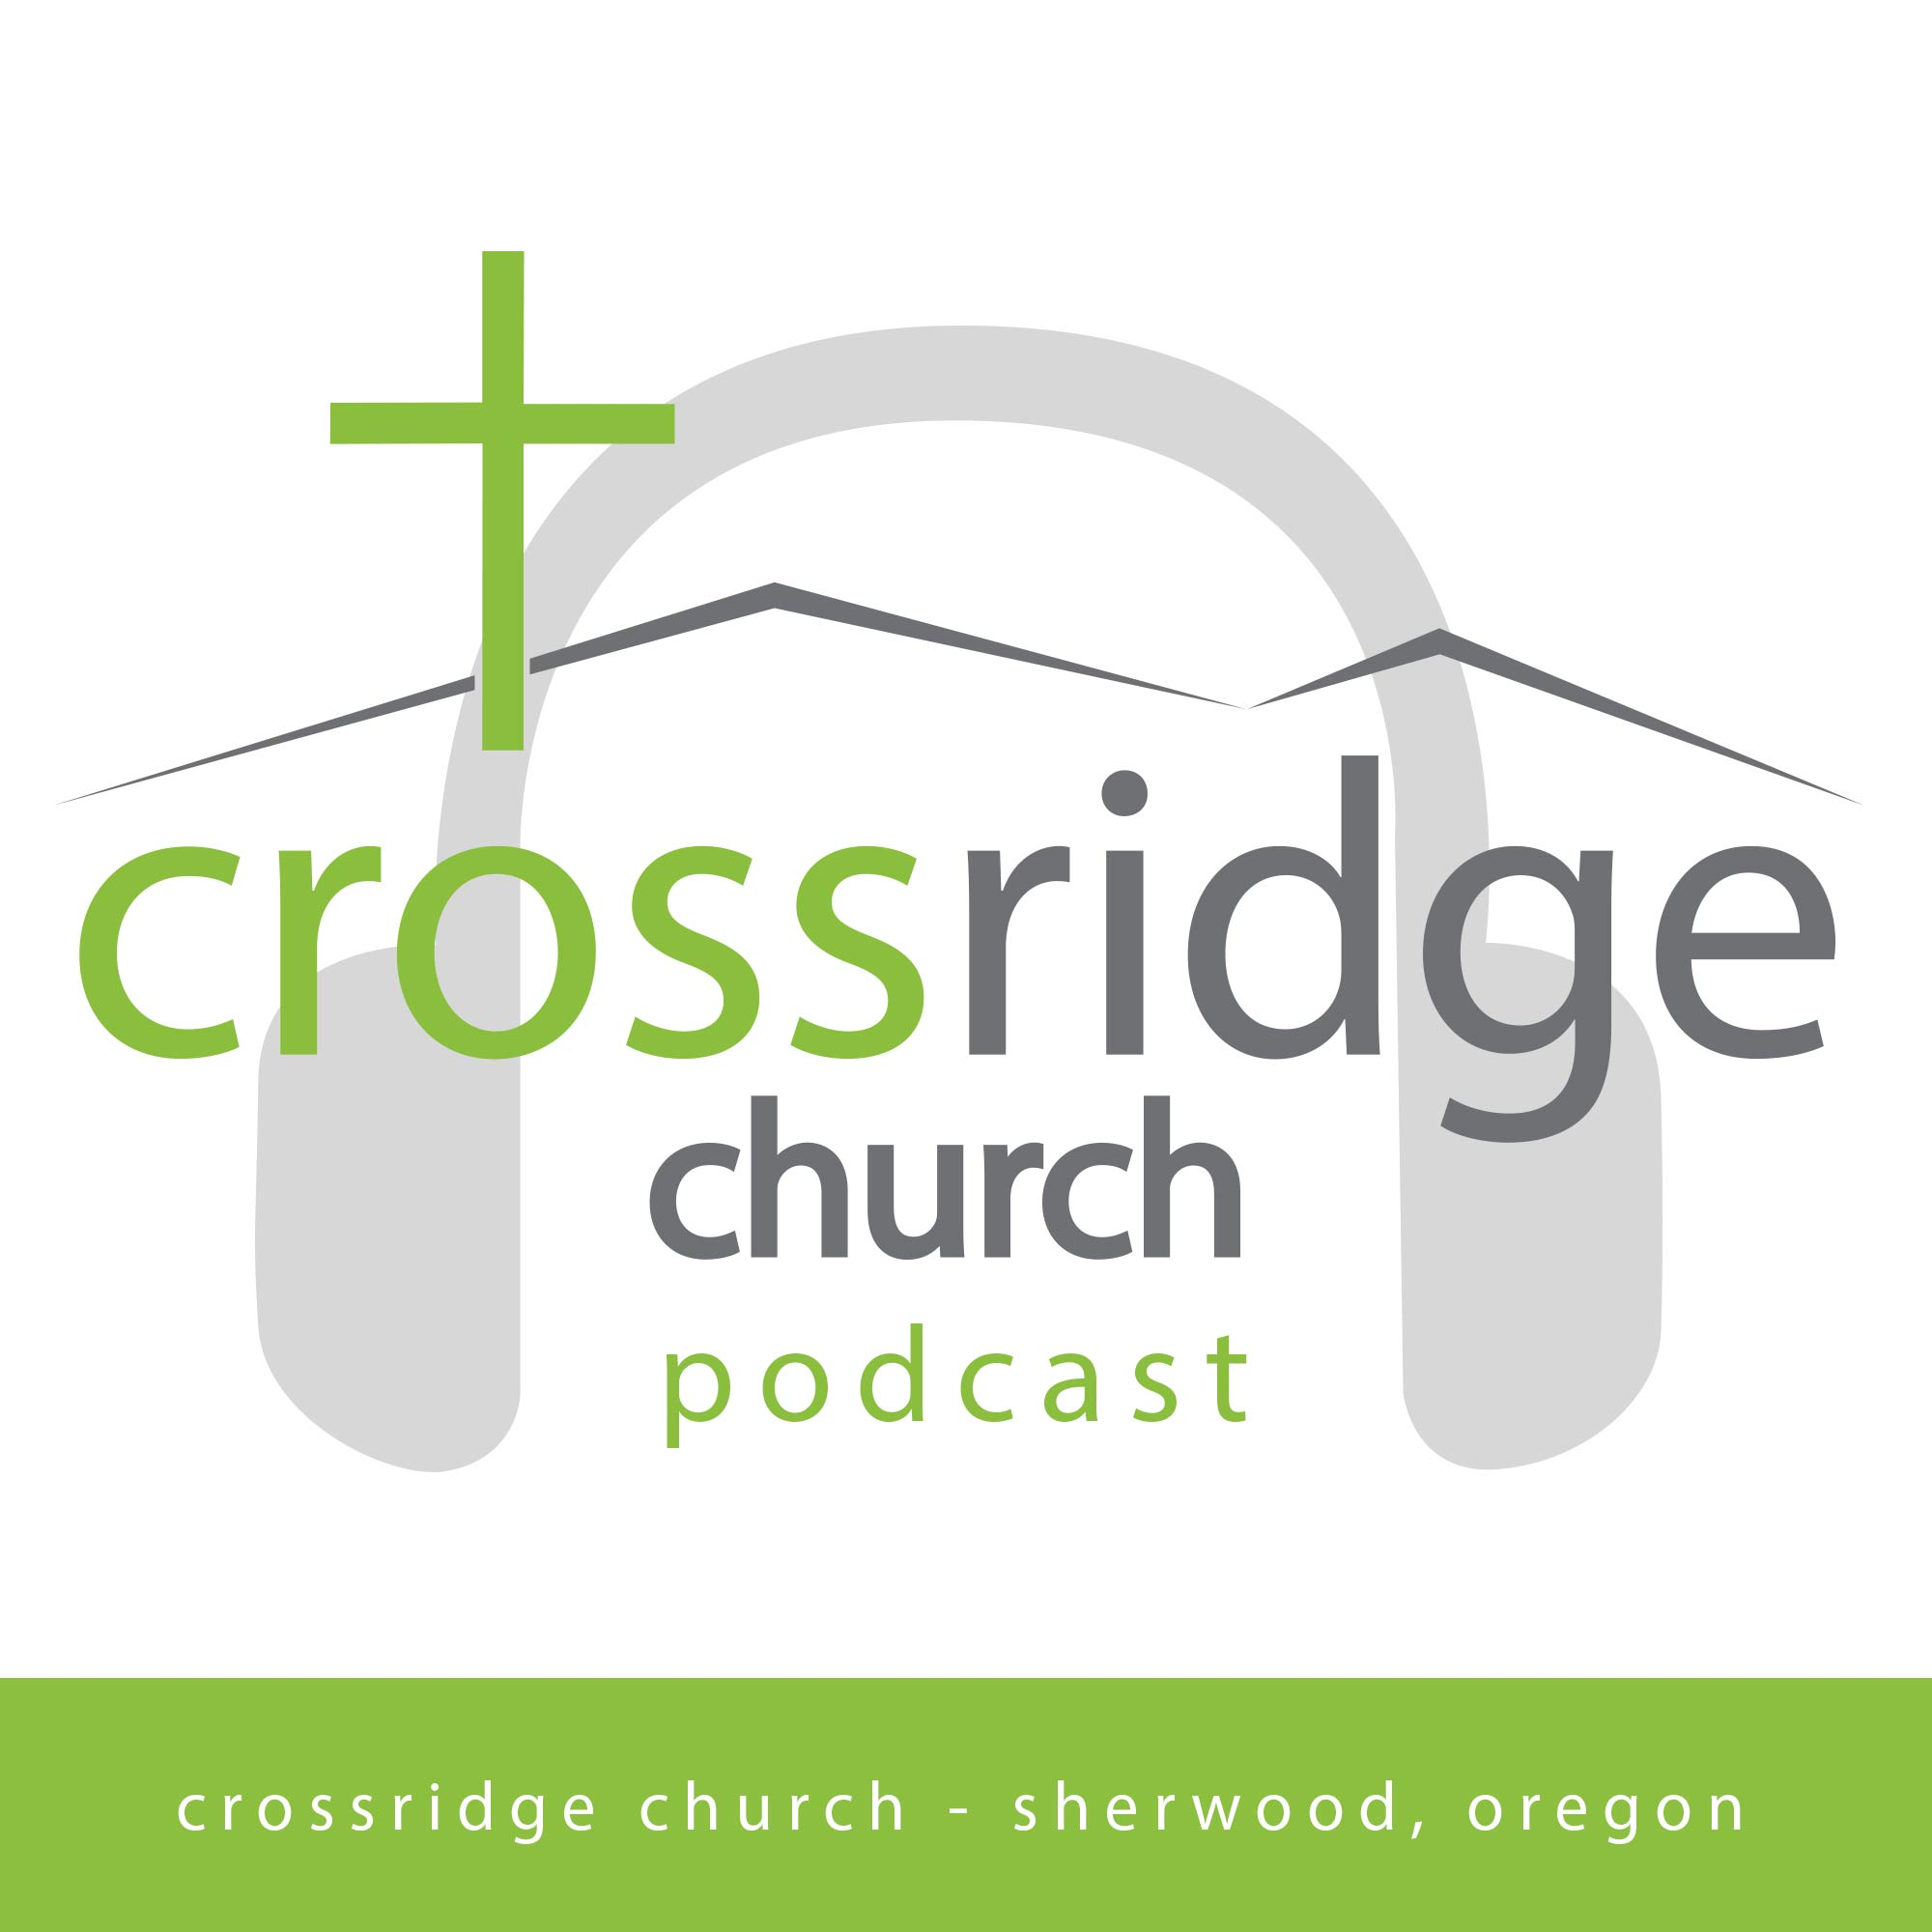 Crossridge Church - Sherwood Oregon show art